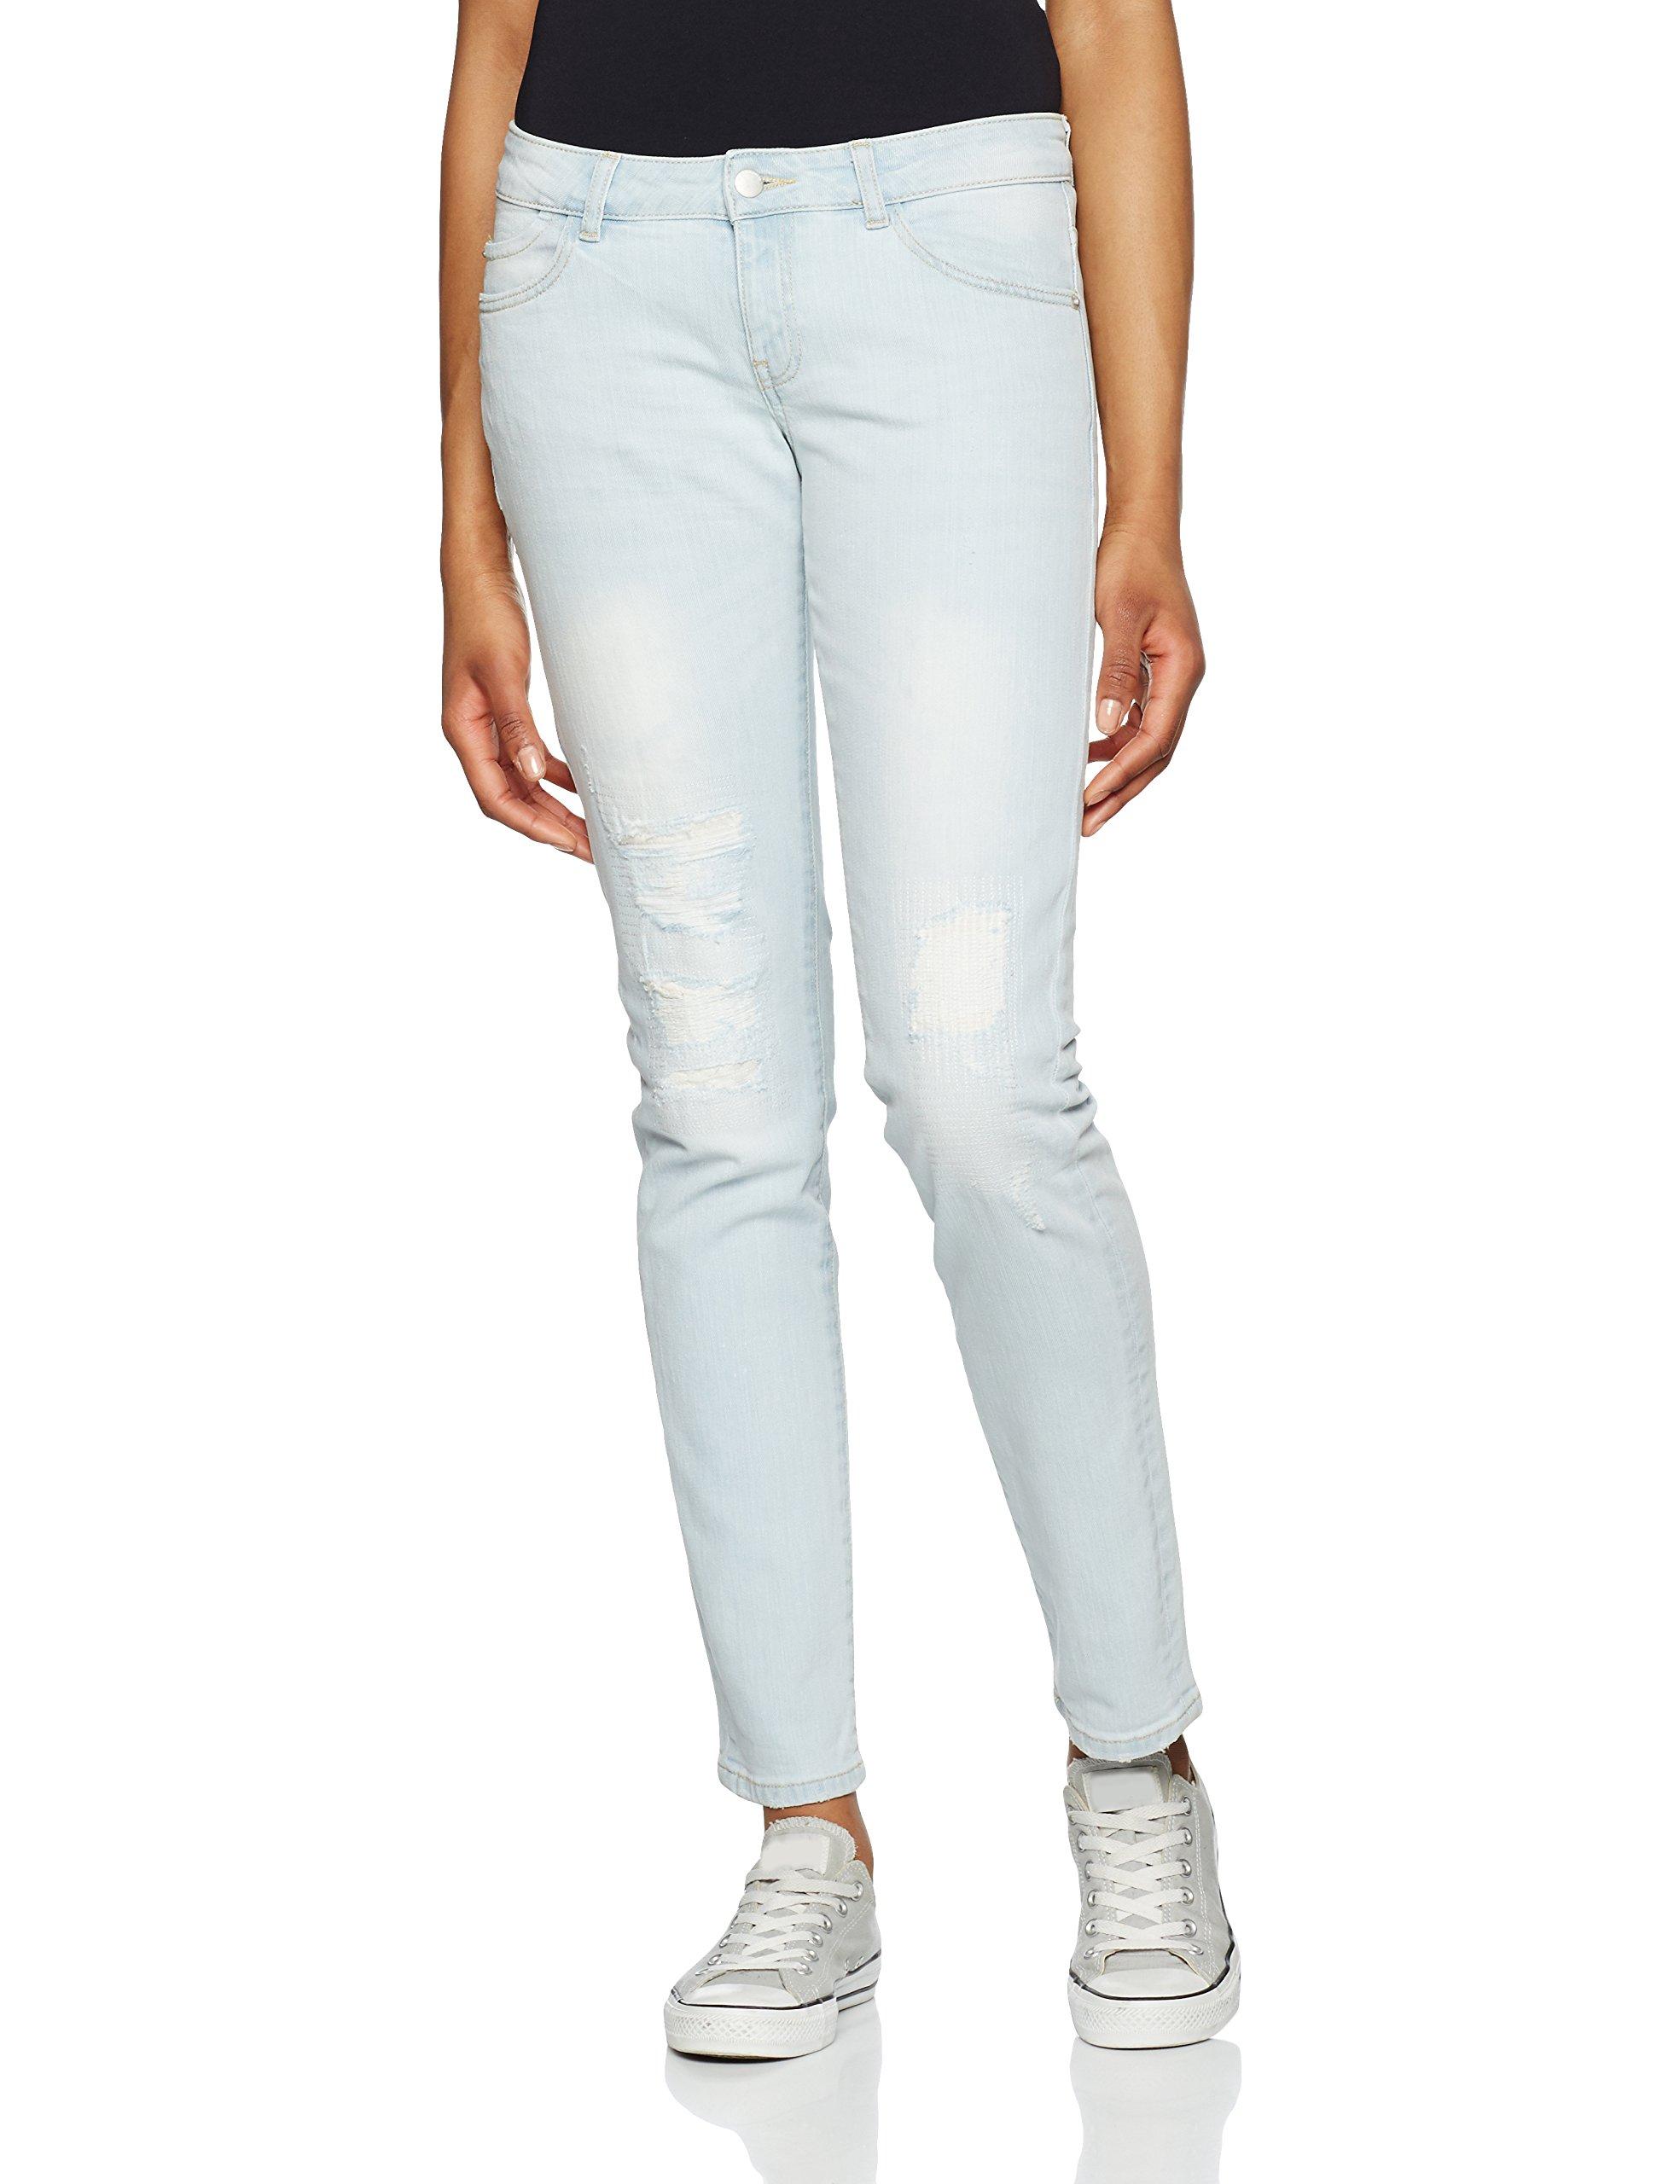 Q By DenimTinted s Designed 41703712546 Femme 52z9W34 JeansBlue 32 FJKl1c